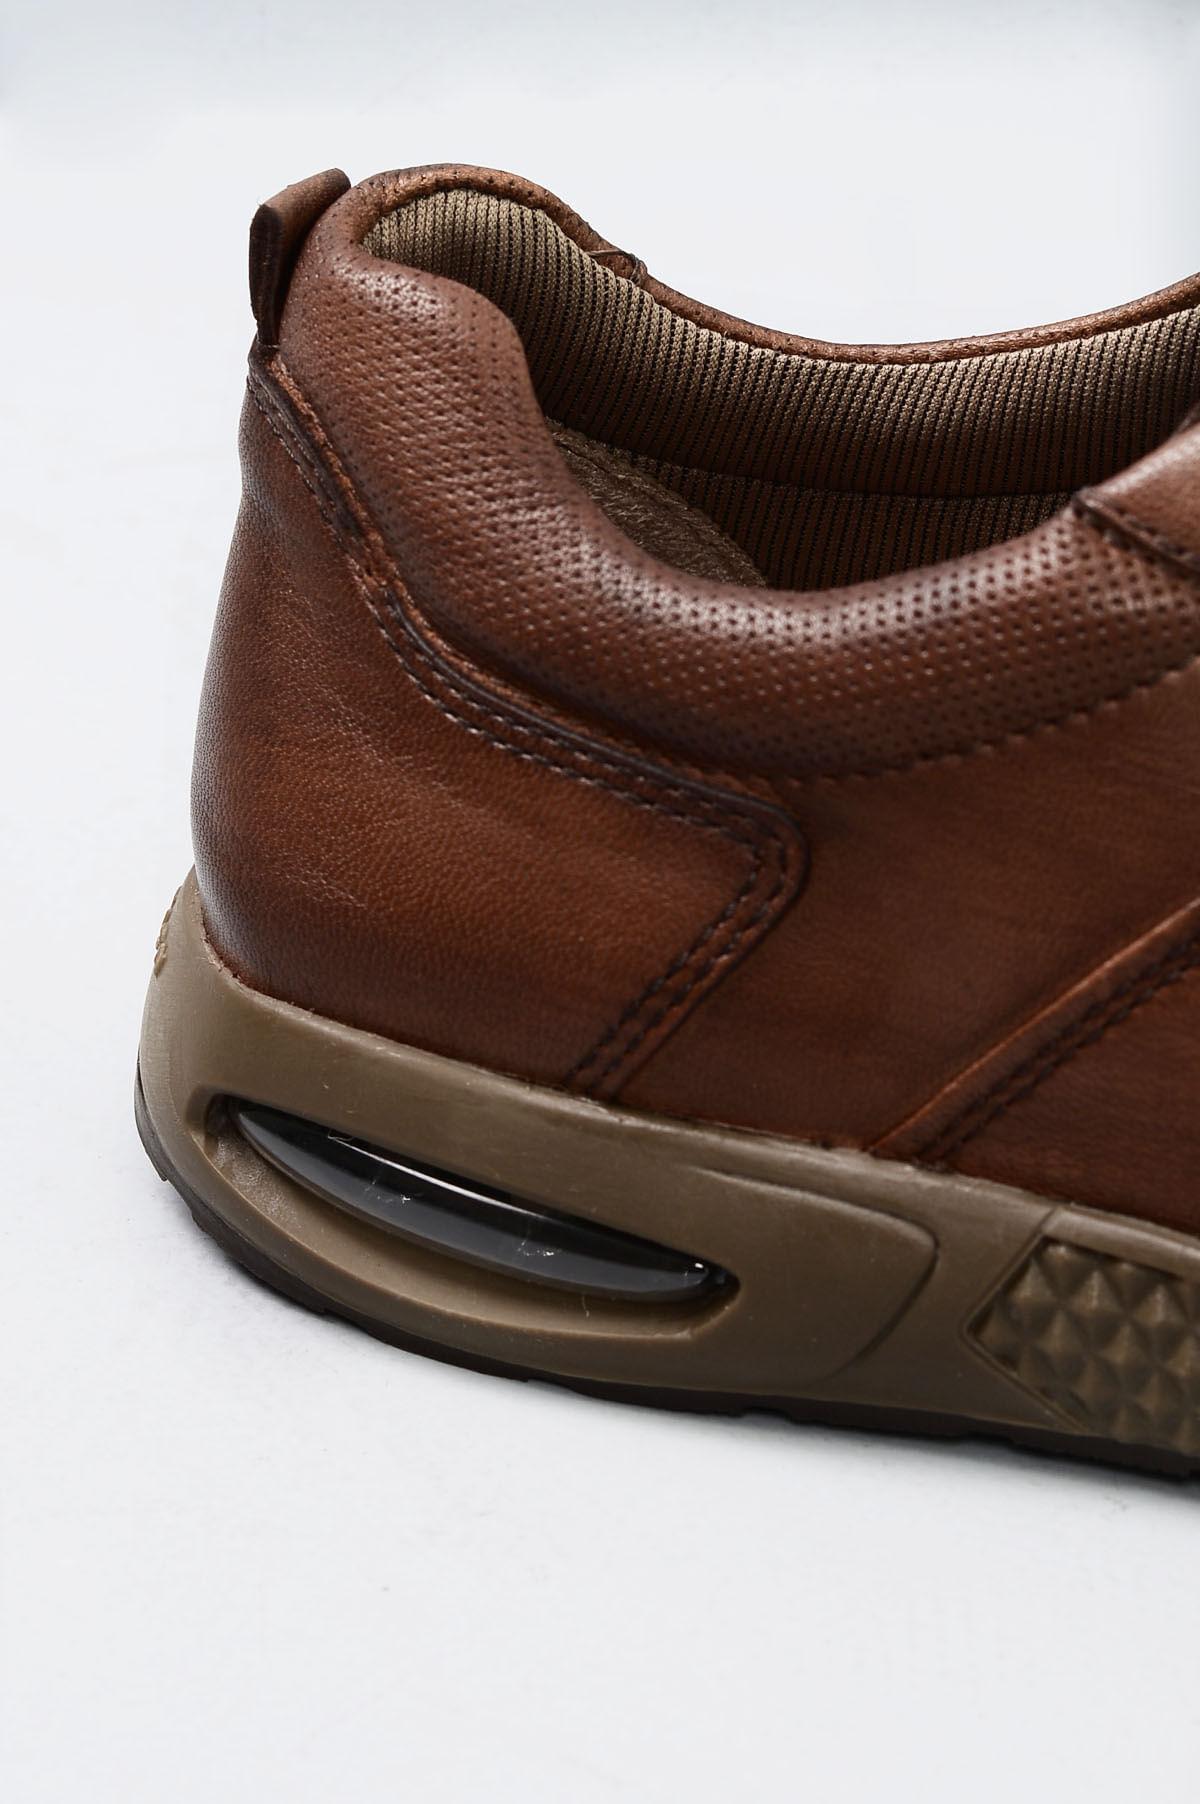 731b784a81933 Sapatênis Masculino Ferricelli Diego CR-CAPPUCCINO - Mundial Calçados